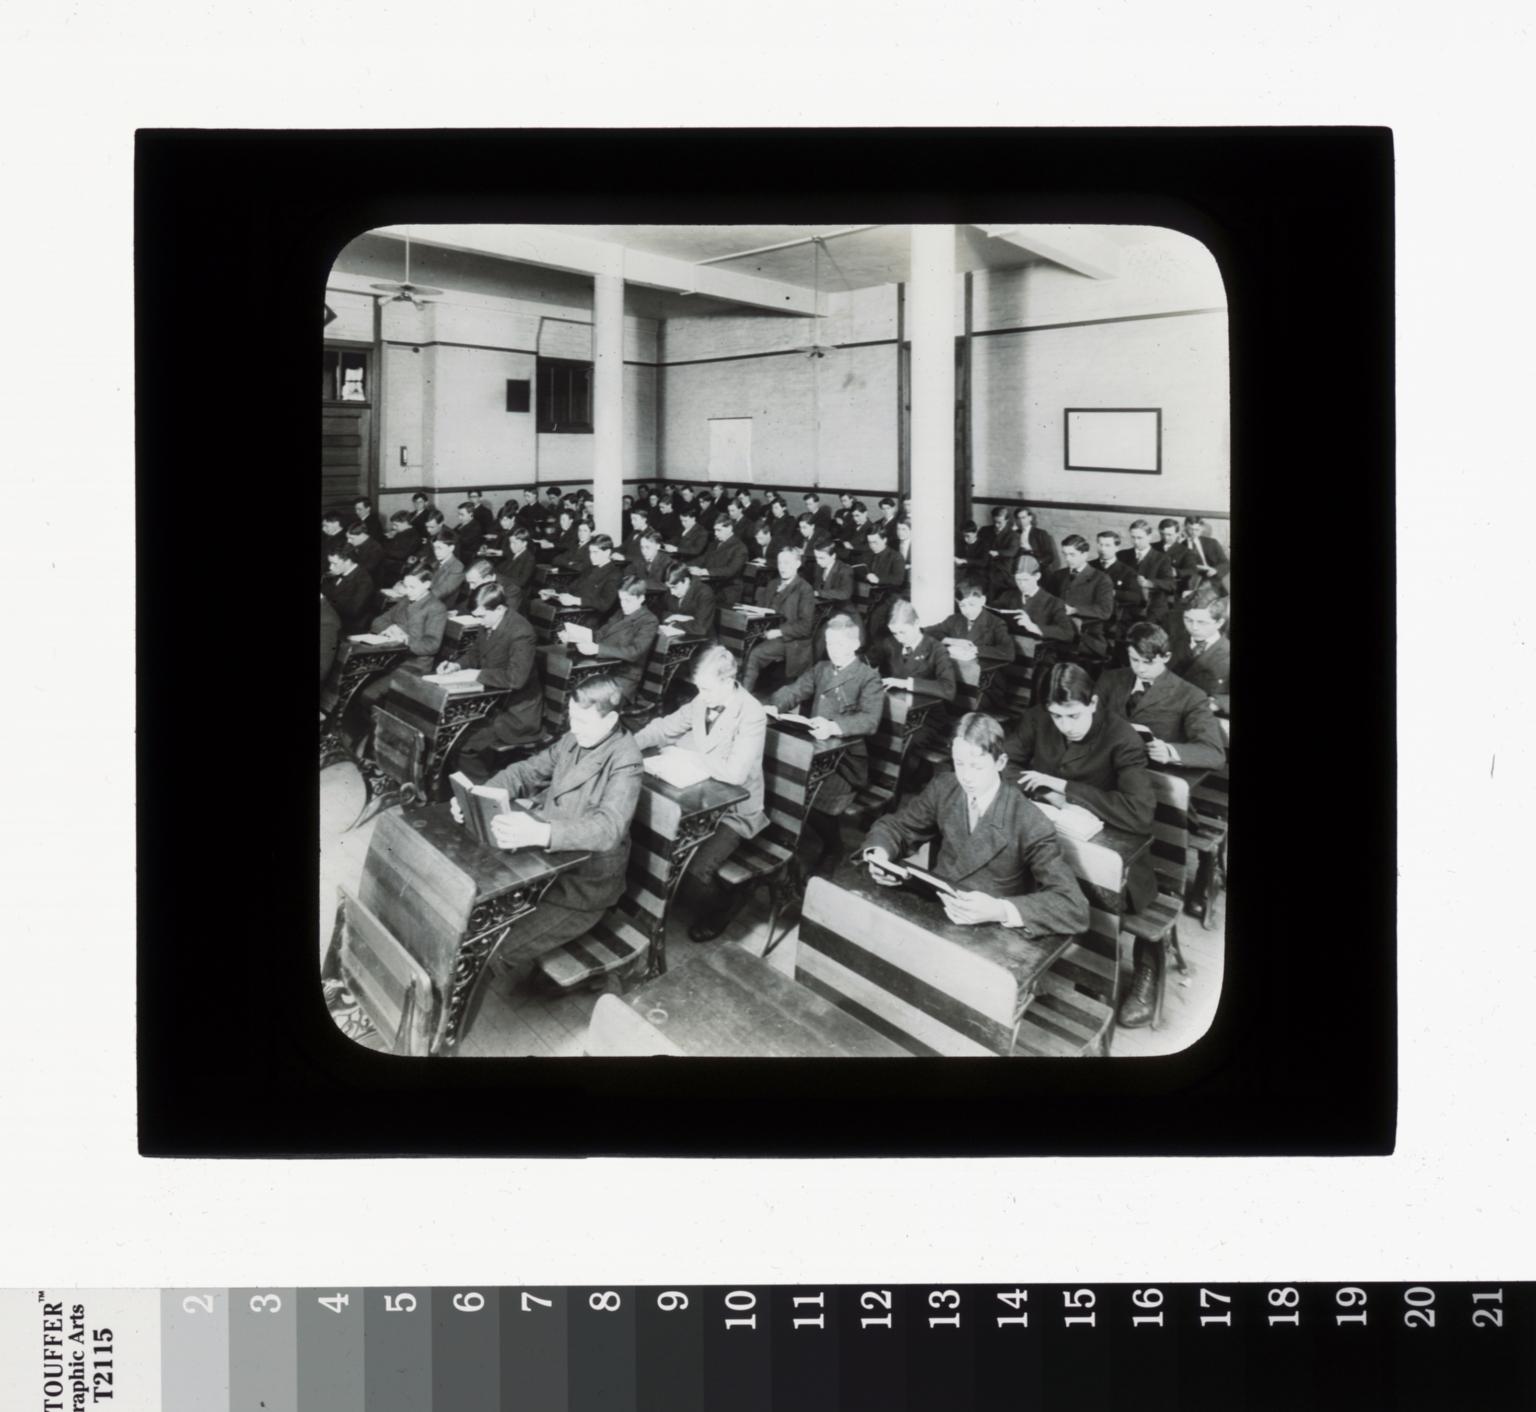 Boys' class, Rochester Athenaeum and Mechanics Institute